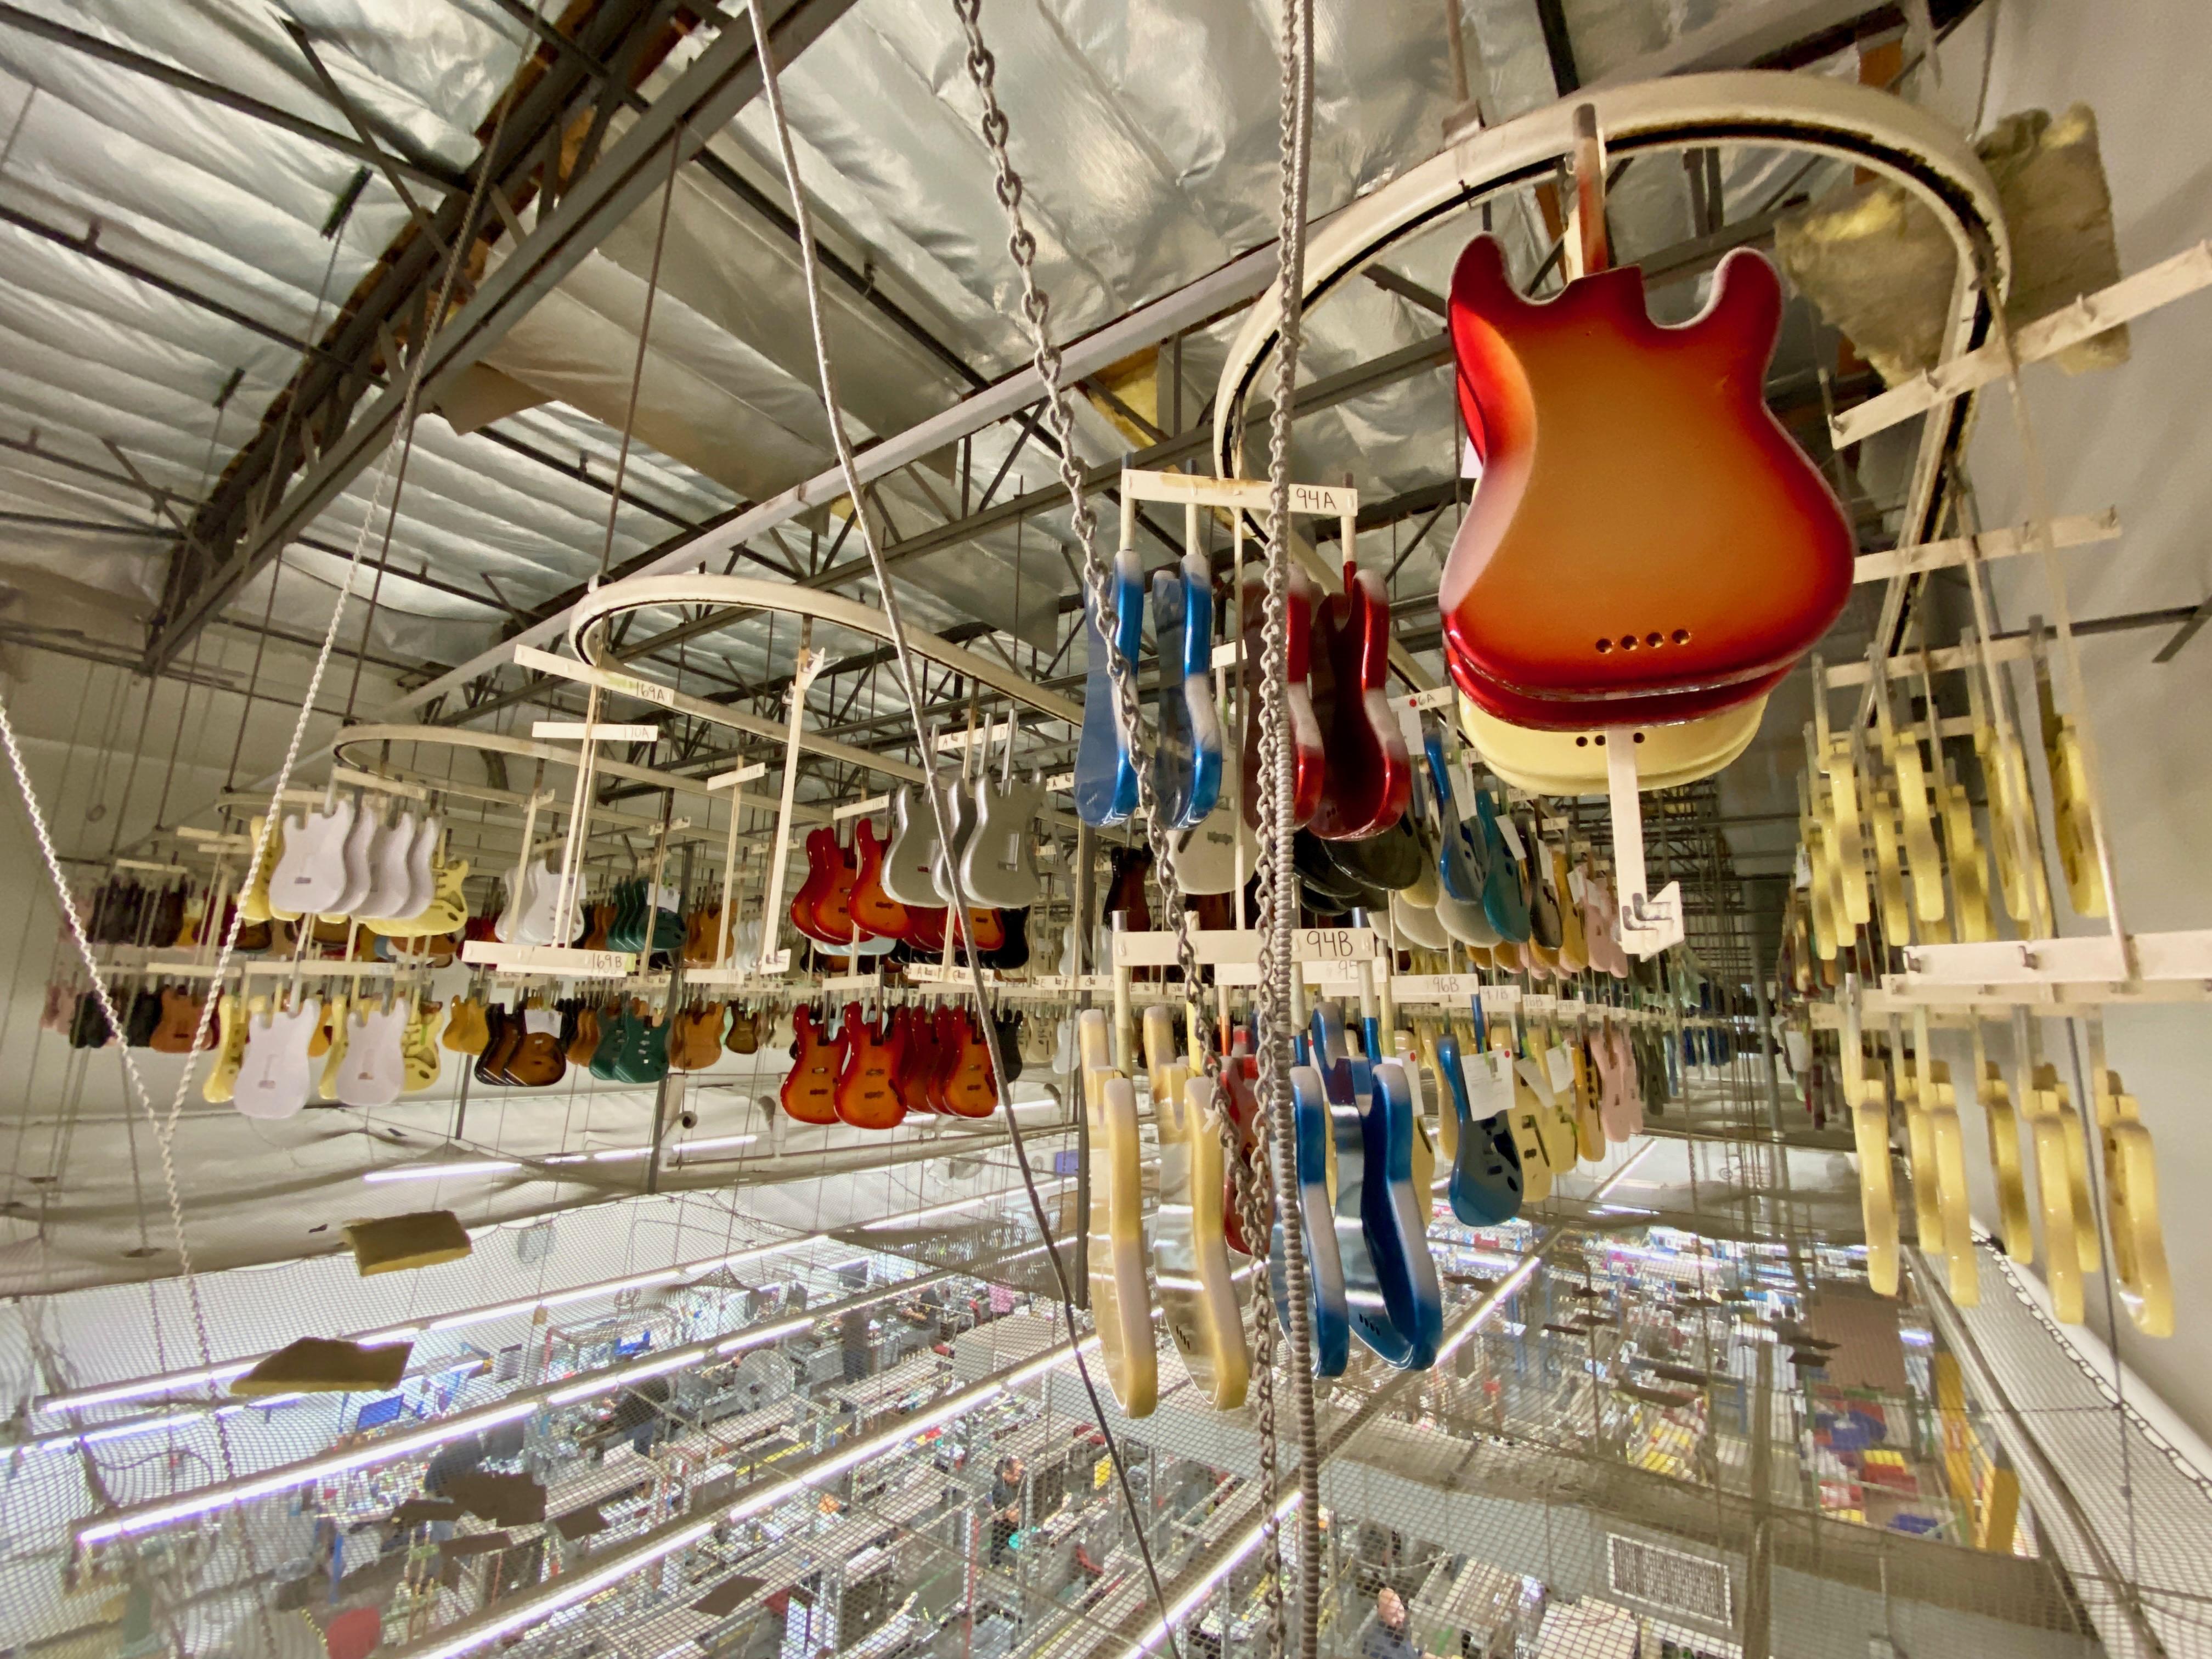 Corpos de guitarra armazenados na fábrica da Fender